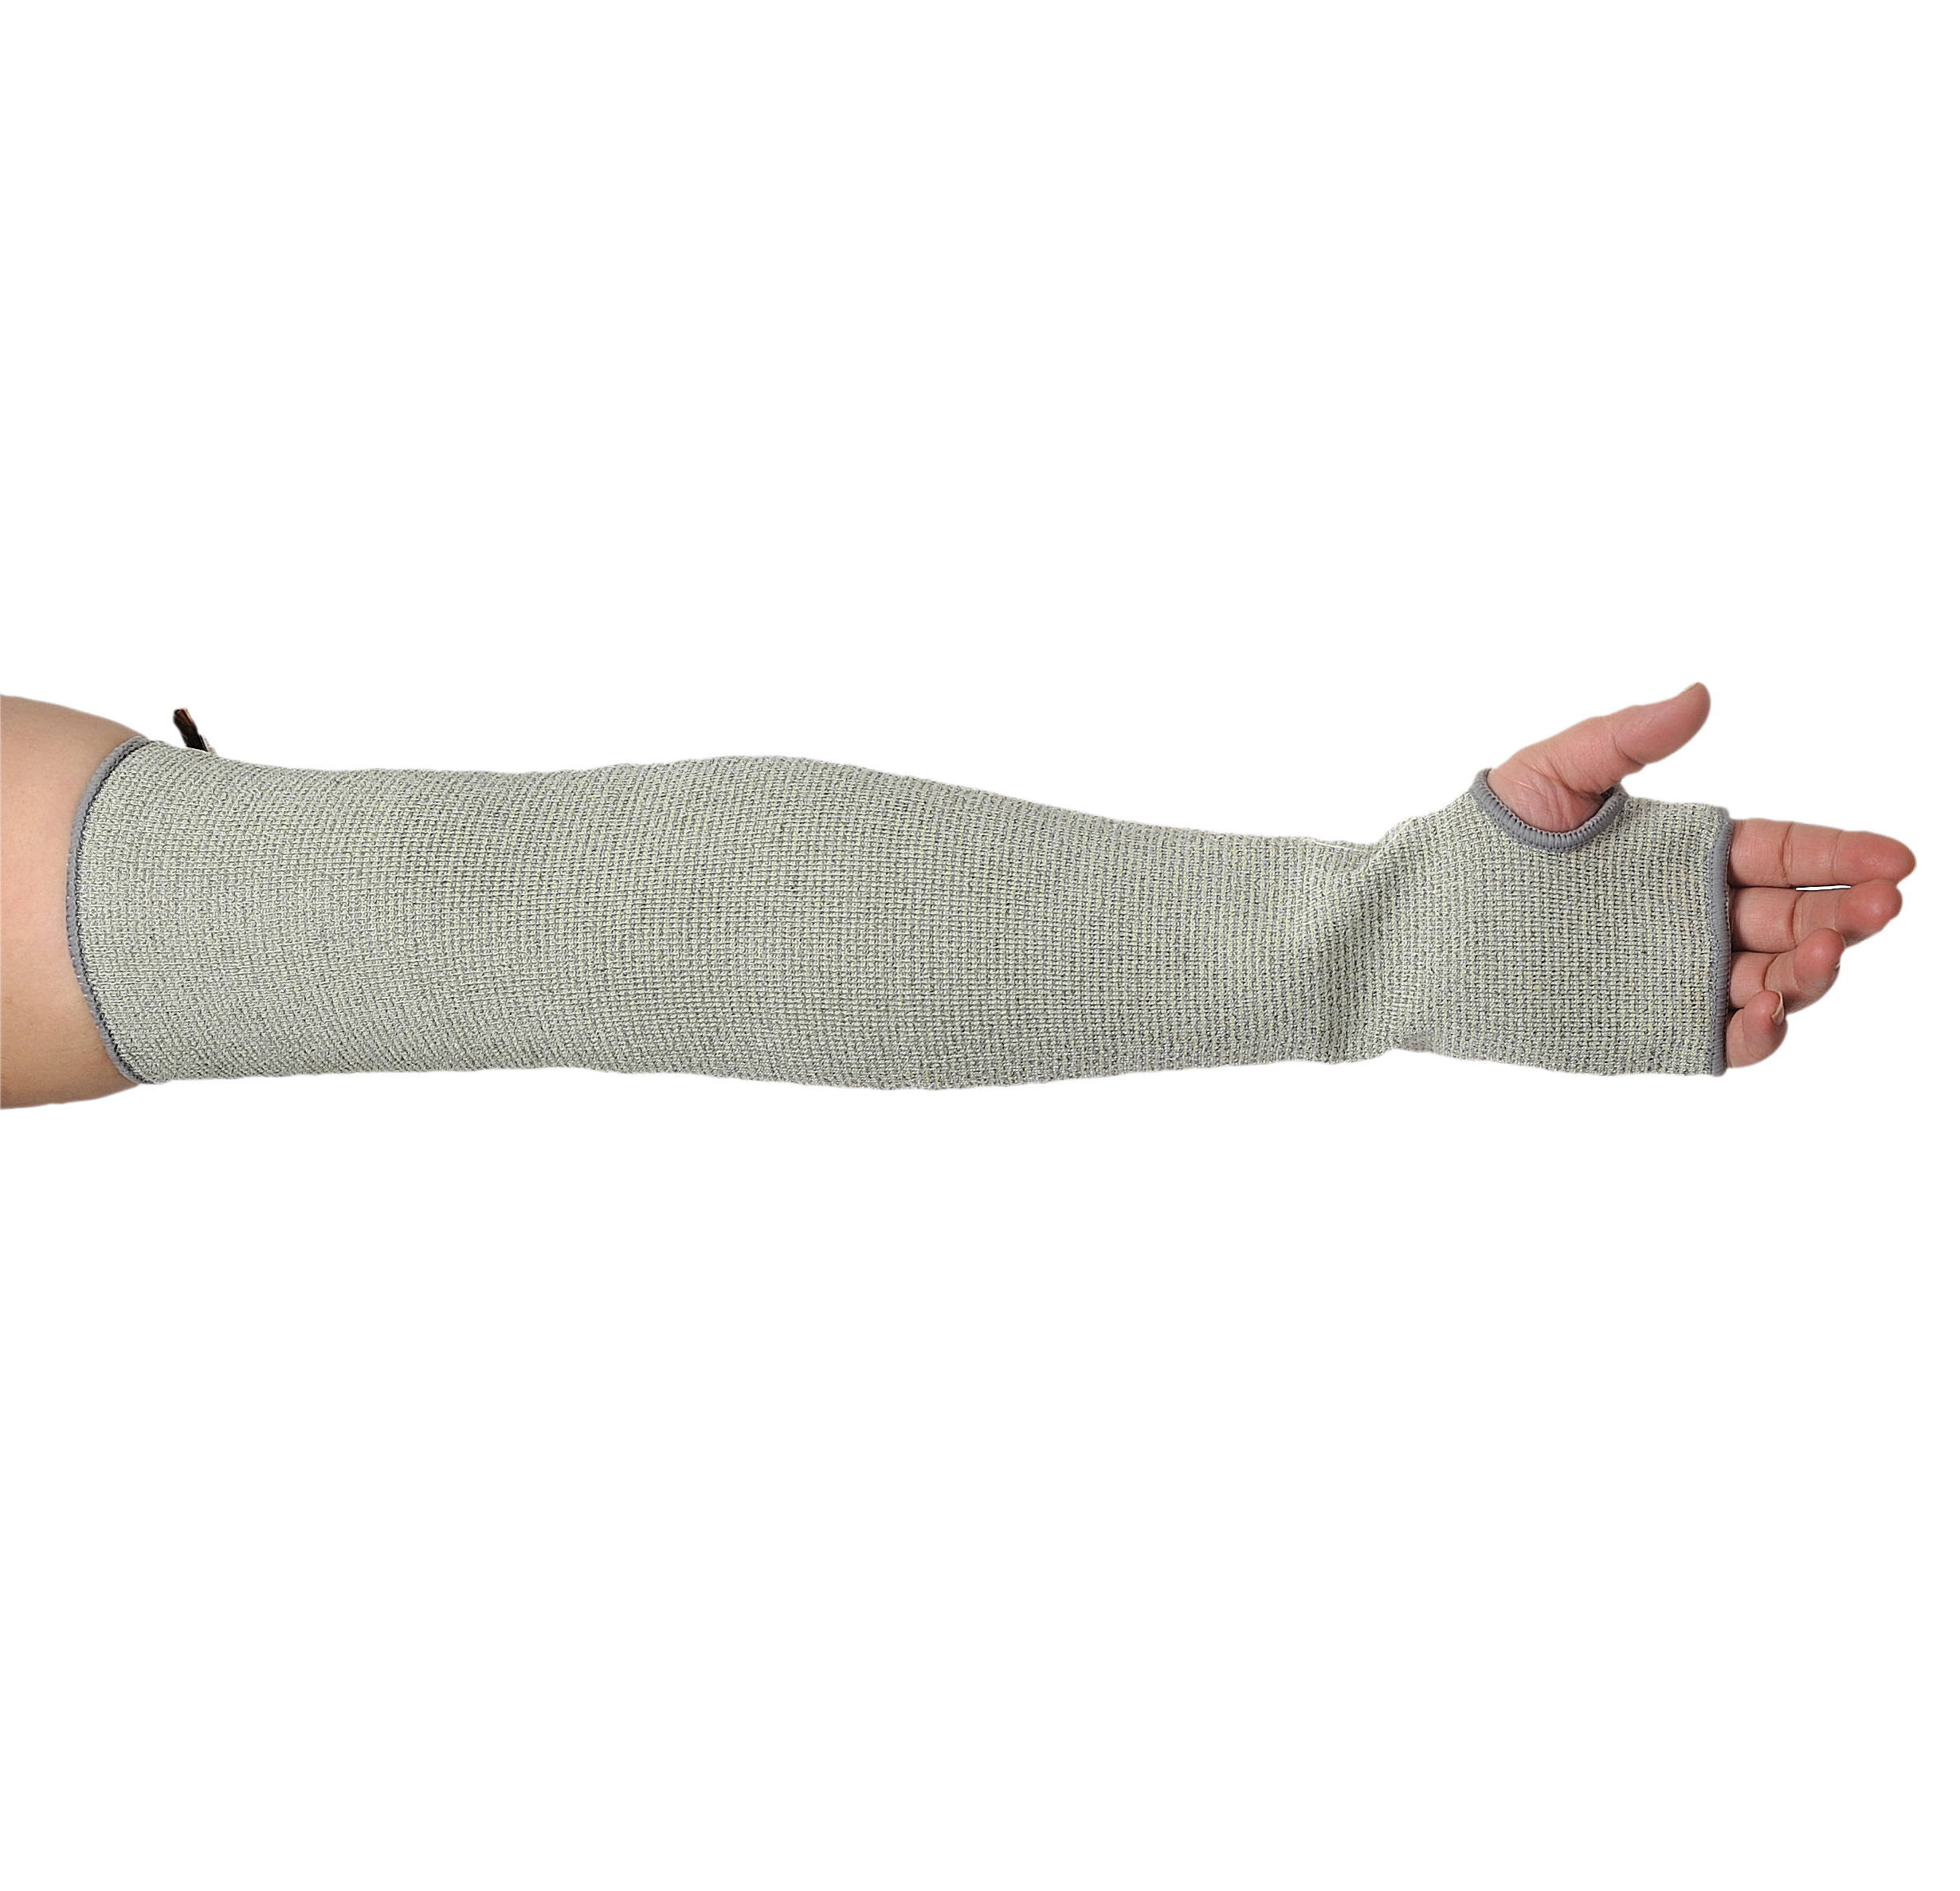 Portwest 22 Inch (56cm) Cut Resistant Sleeve - A691